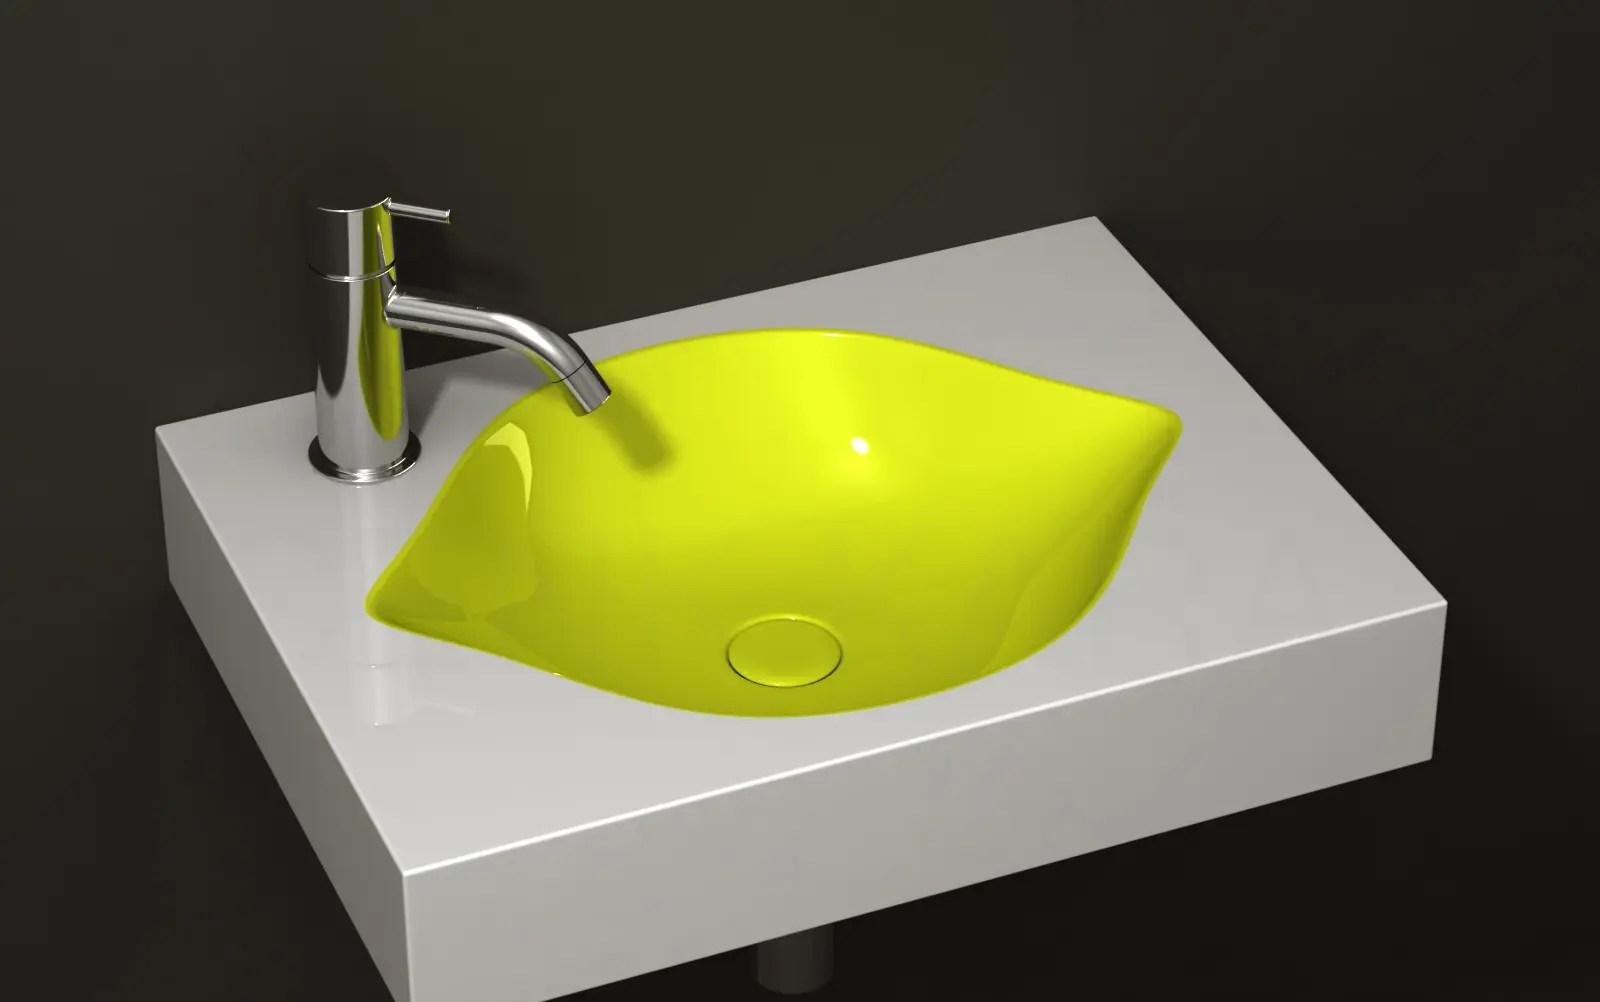 Cool FruitInspired Bathroom Sinks  Lemon by Cenk Kara